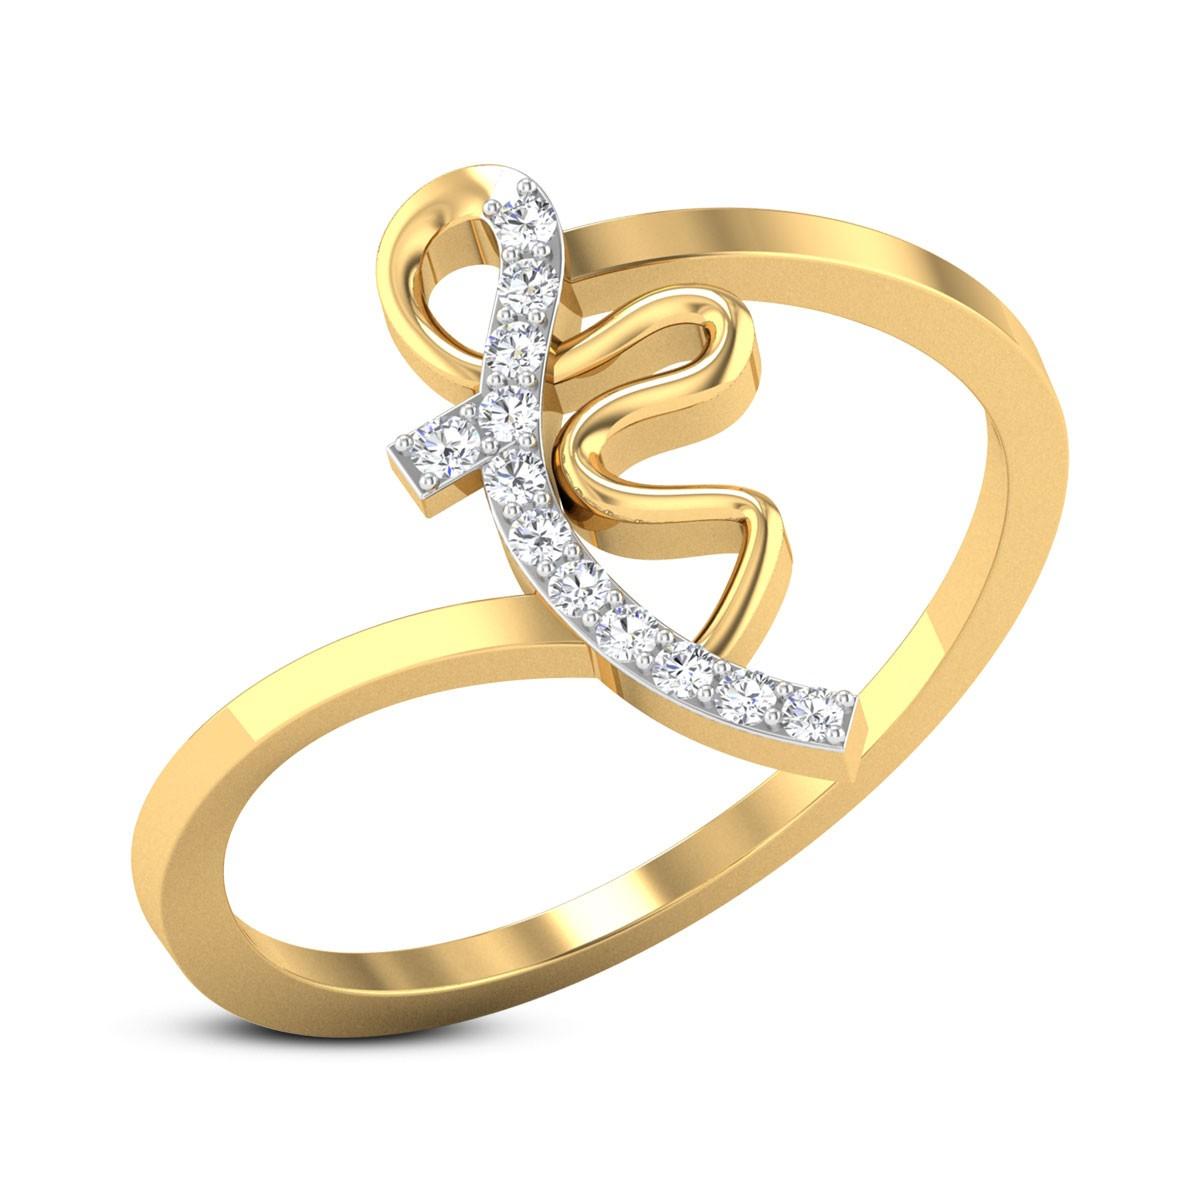 Buy Lisa Diamond Ring in 2.24 Grams Gold Online